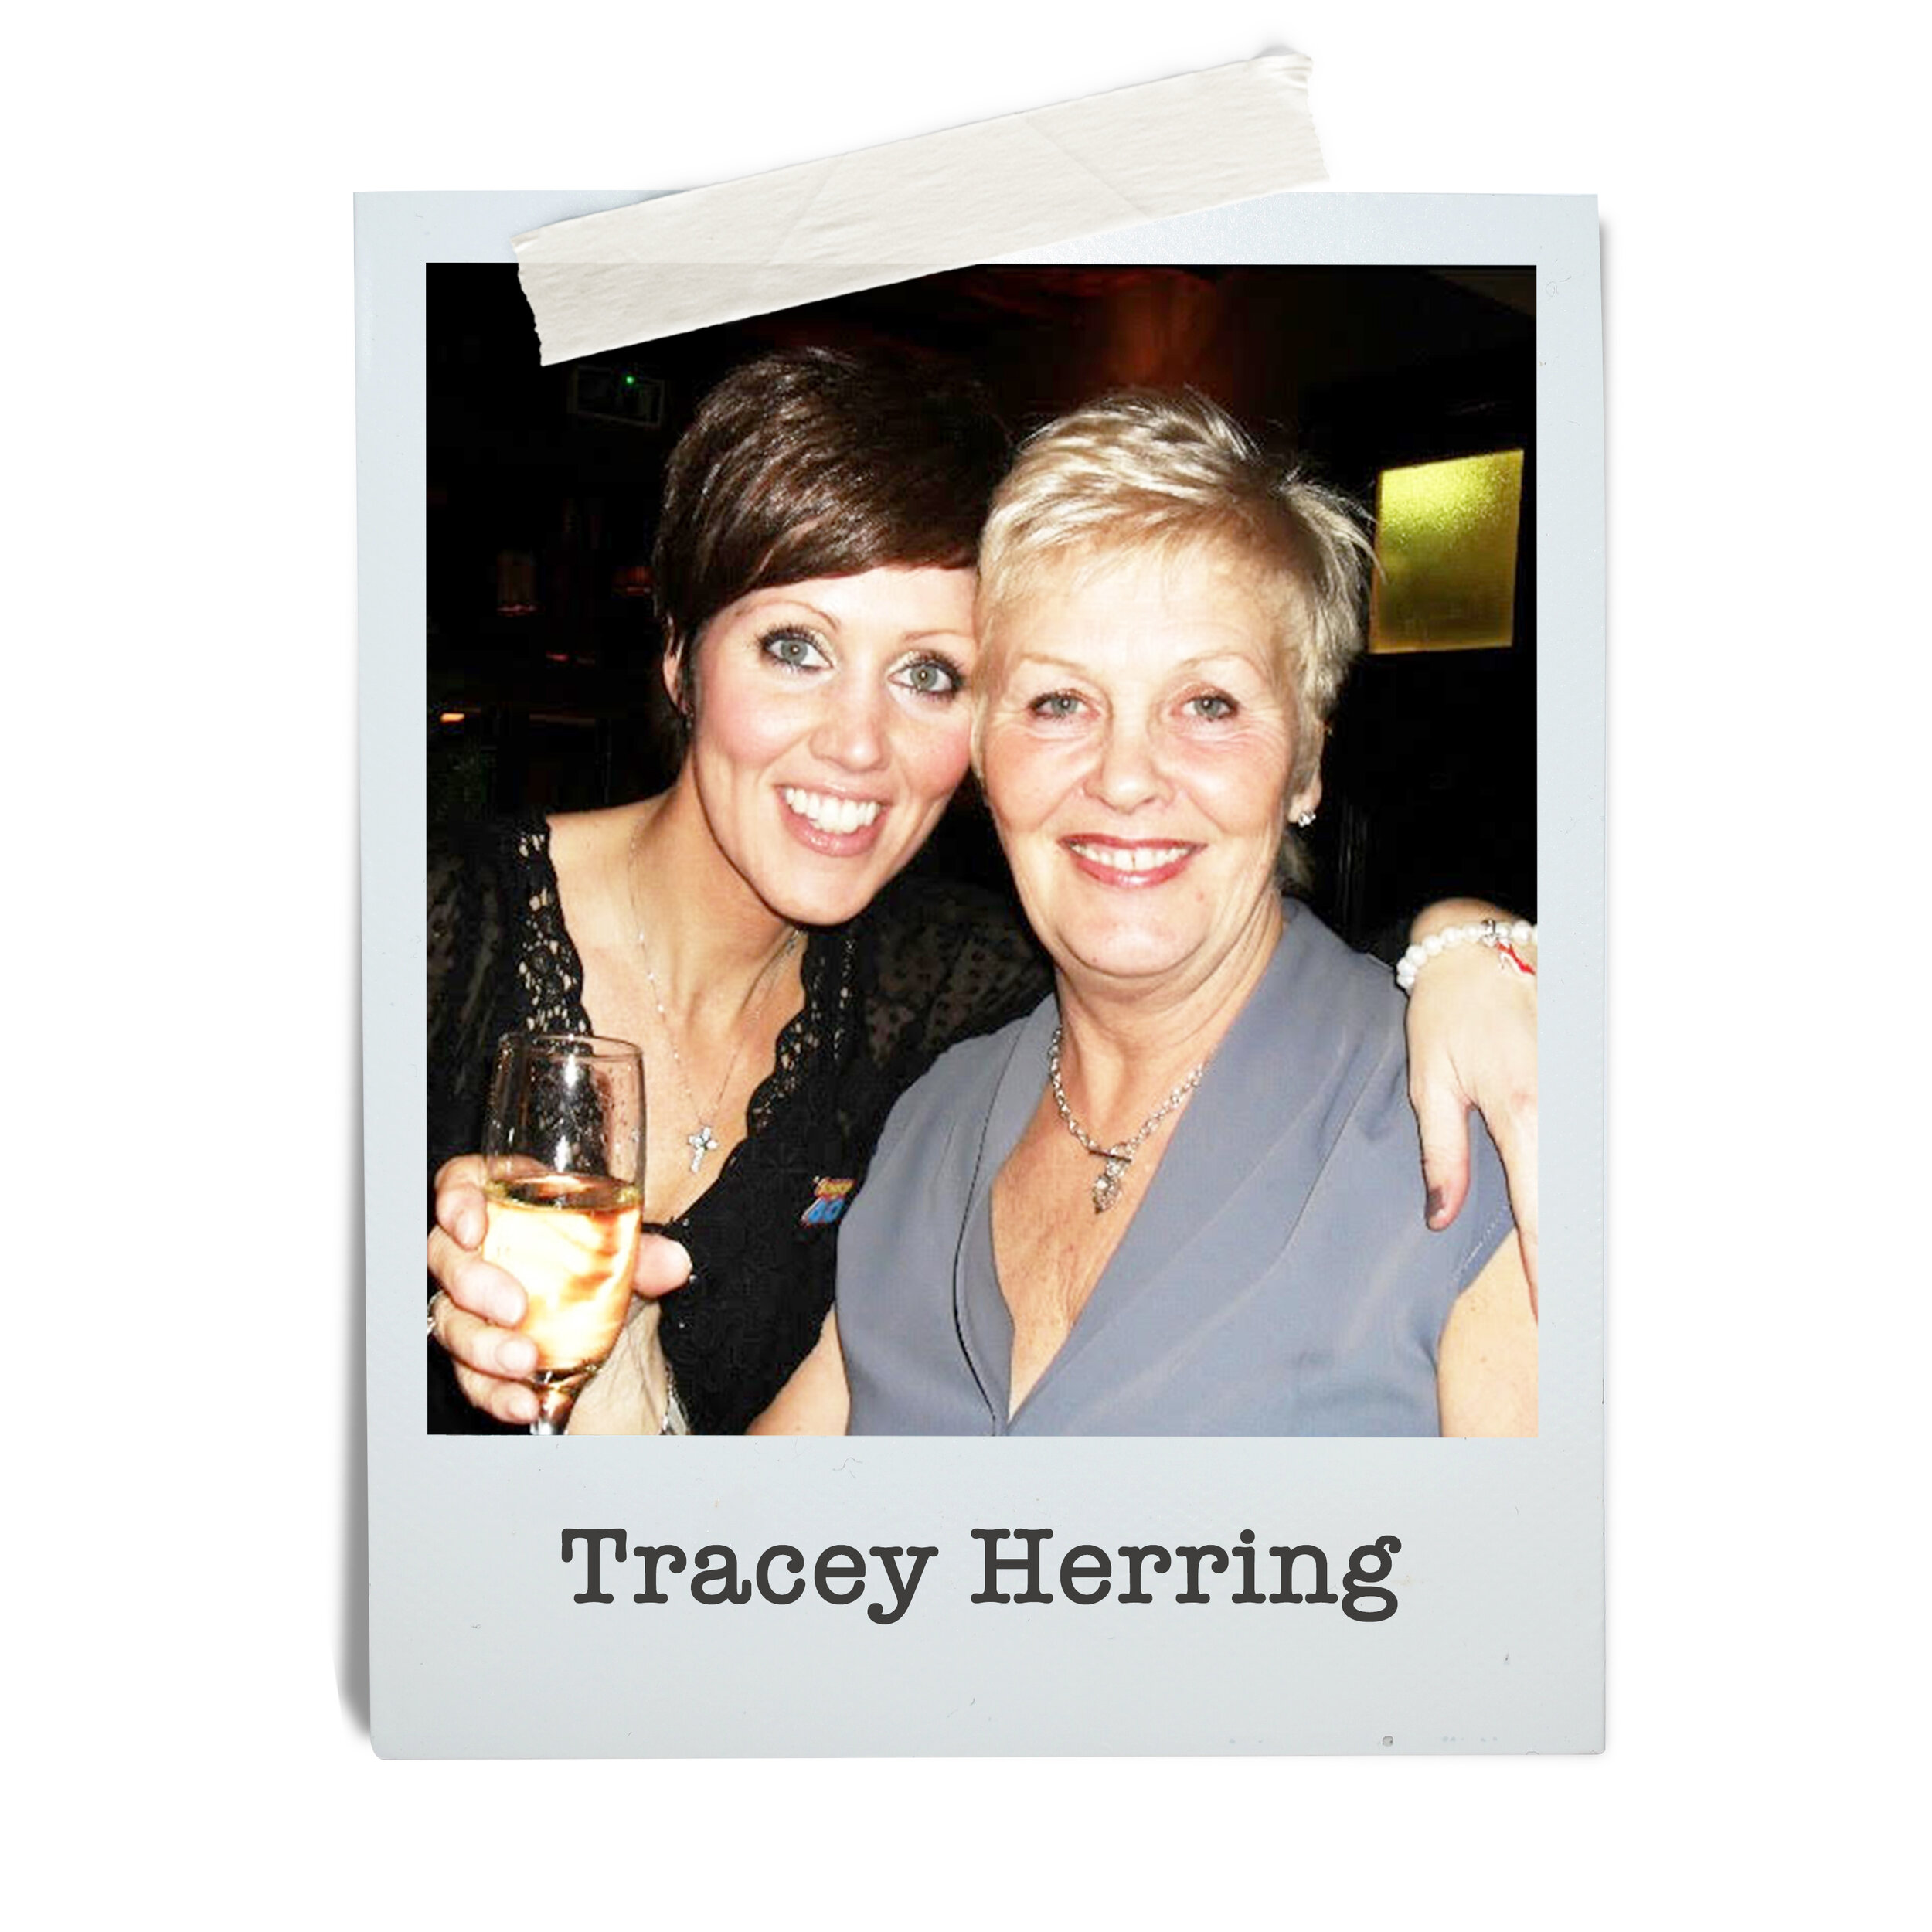 Tracey Herring